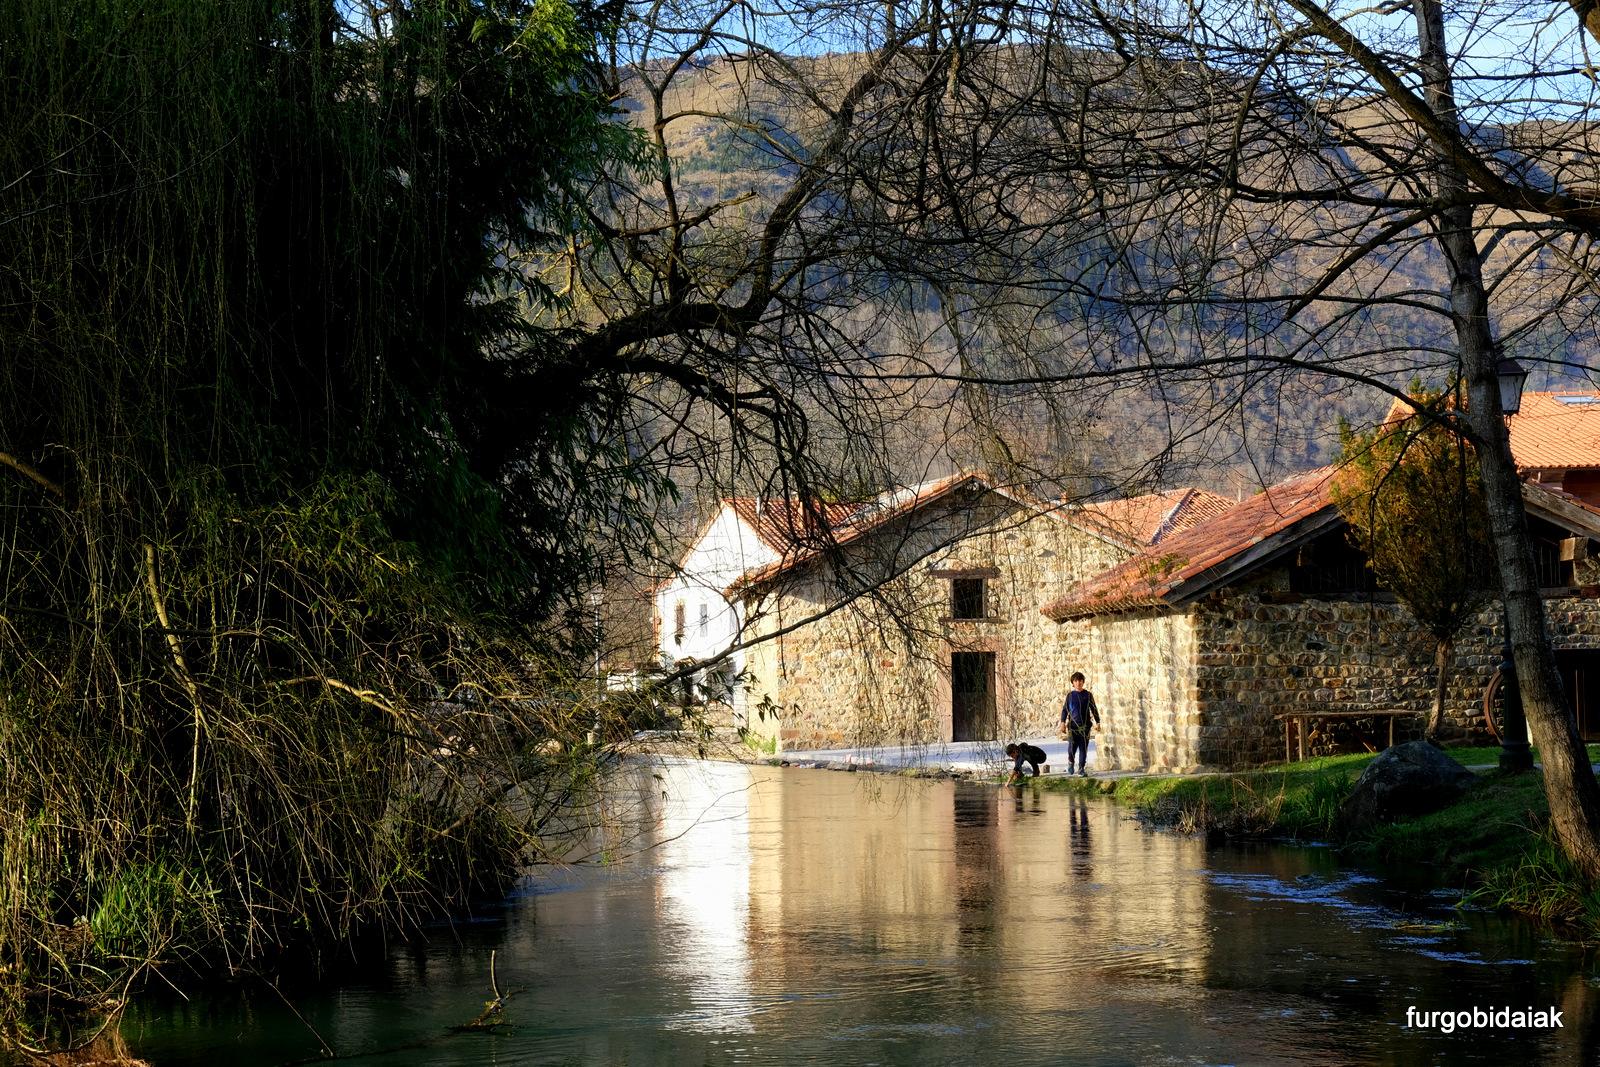 La Fuentona, Saja-Nansa, Cantabria